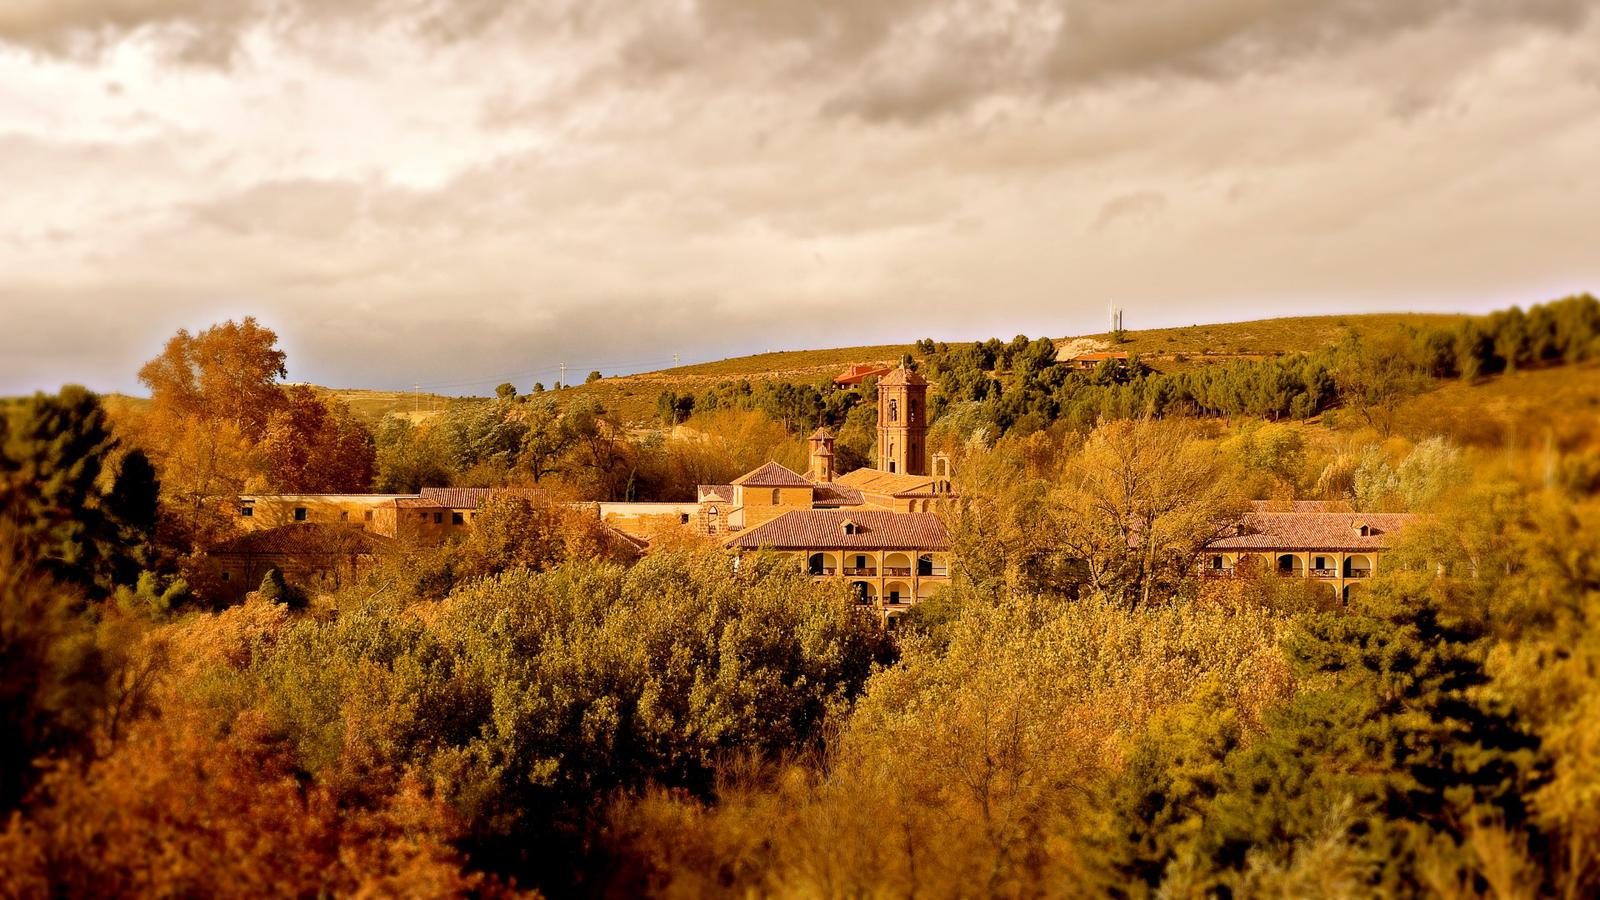 Monasterio de Piedra - View (Large)